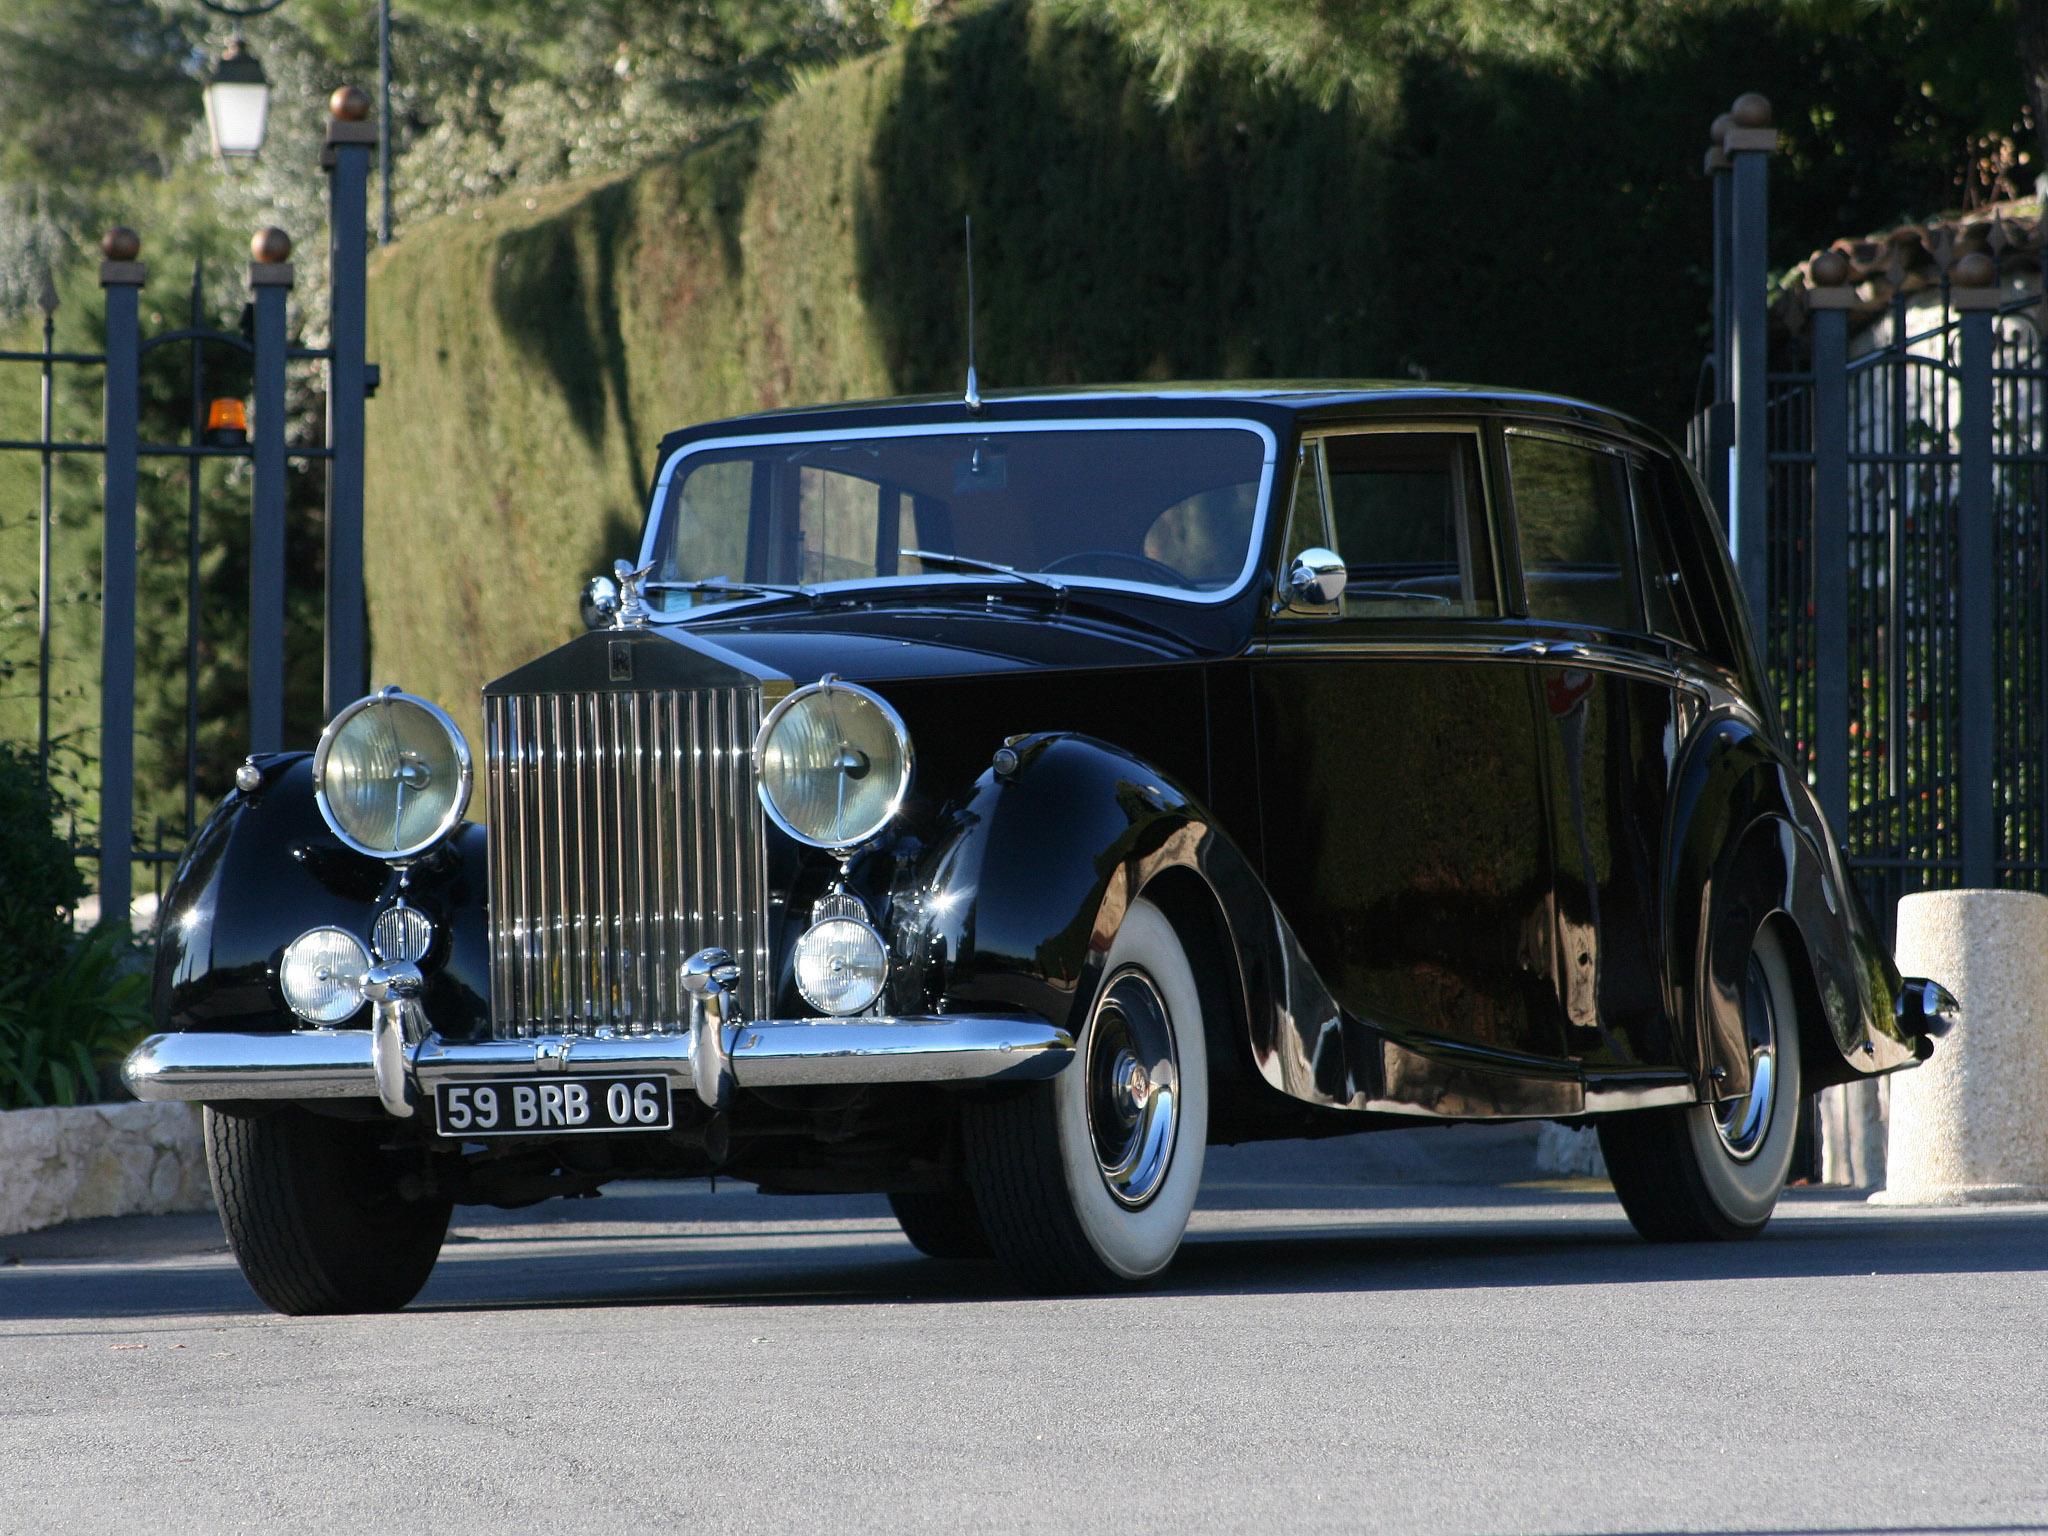 Rolls Royce Silver Wraith Limousine By Hooper 1953 Rolls